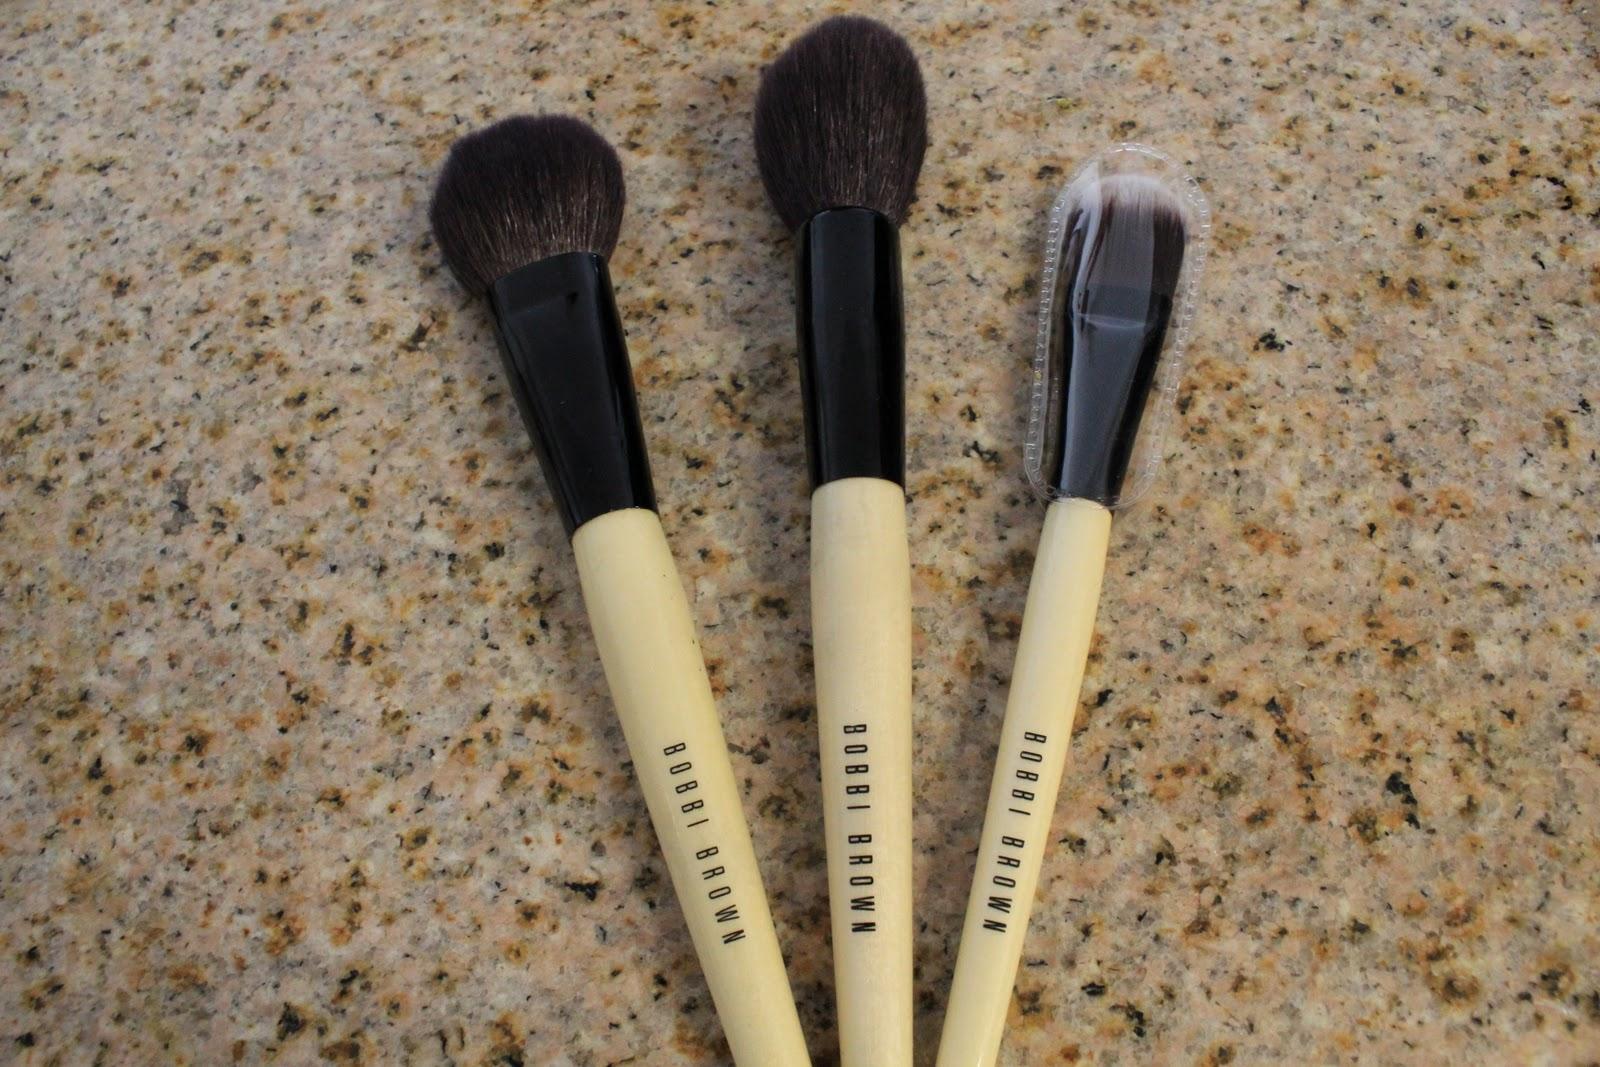 bobbi brown powder brush. bobbi brown powder, blush and foundation brush powder